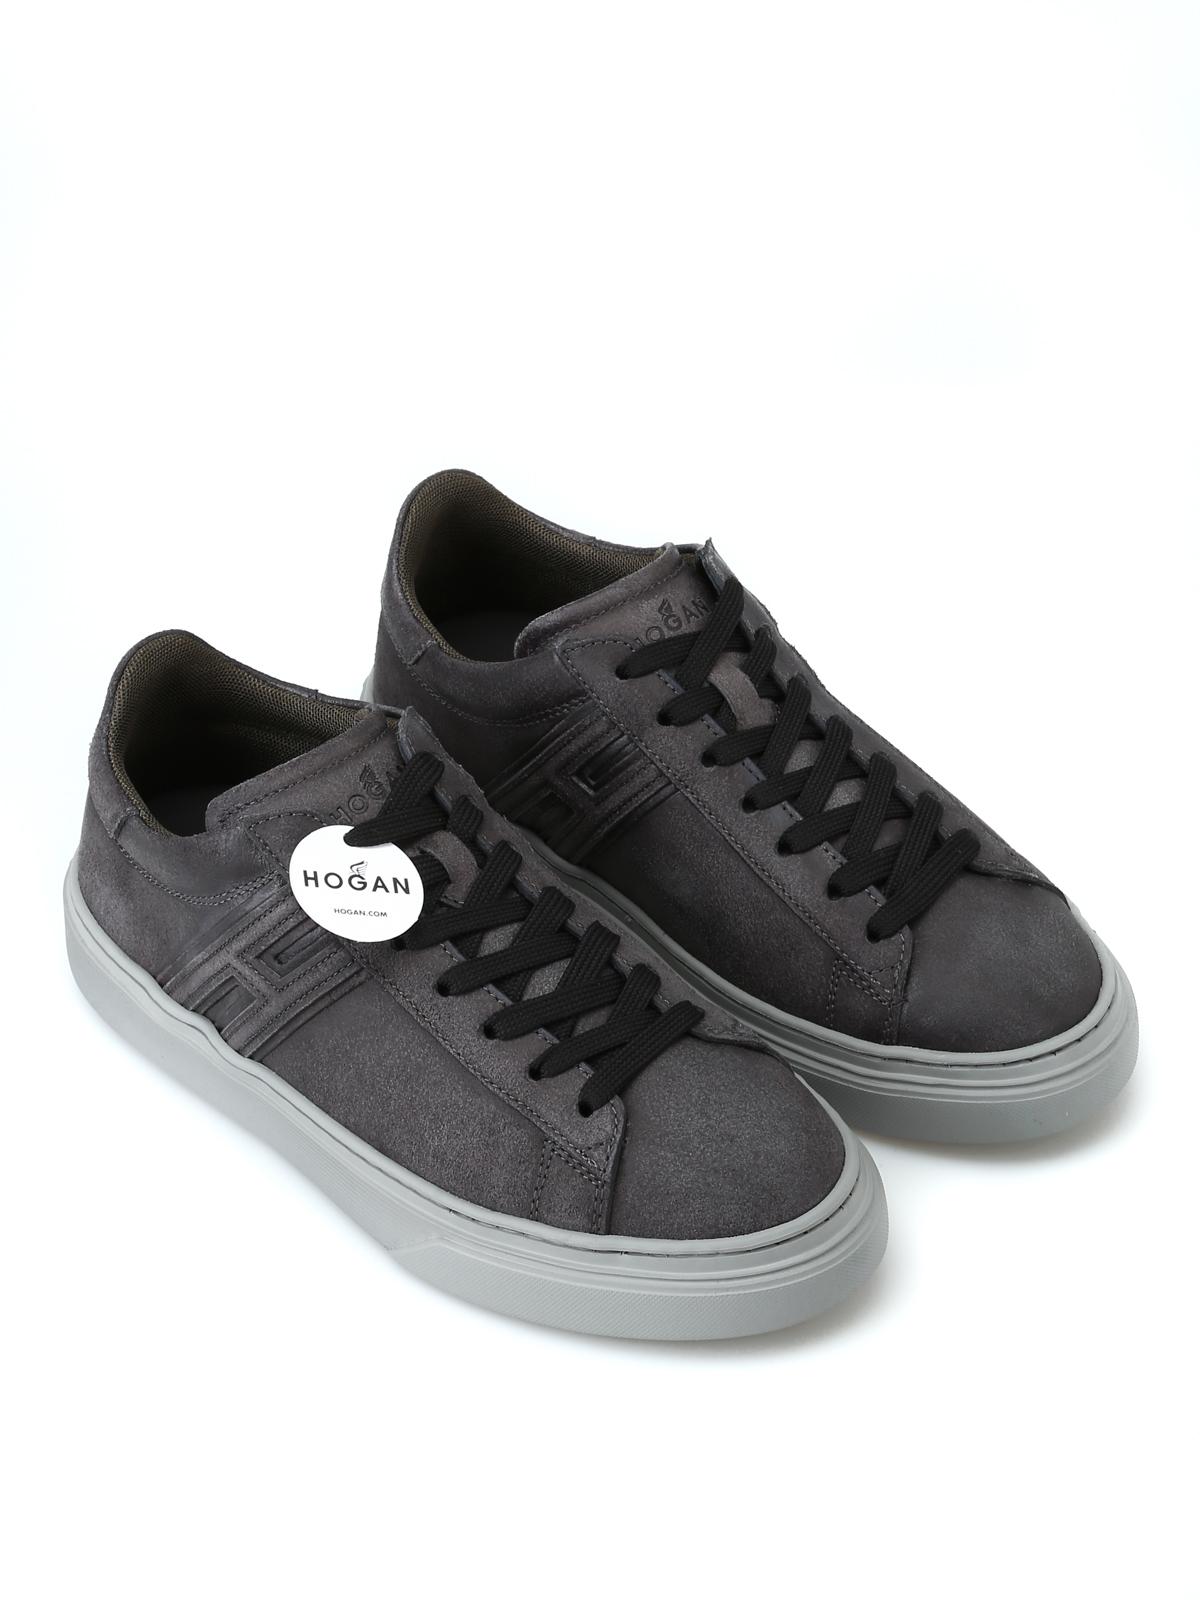 Sneakers Hogan - Sneaker H365 grigie in pelle - HXM3650J310GZXB612